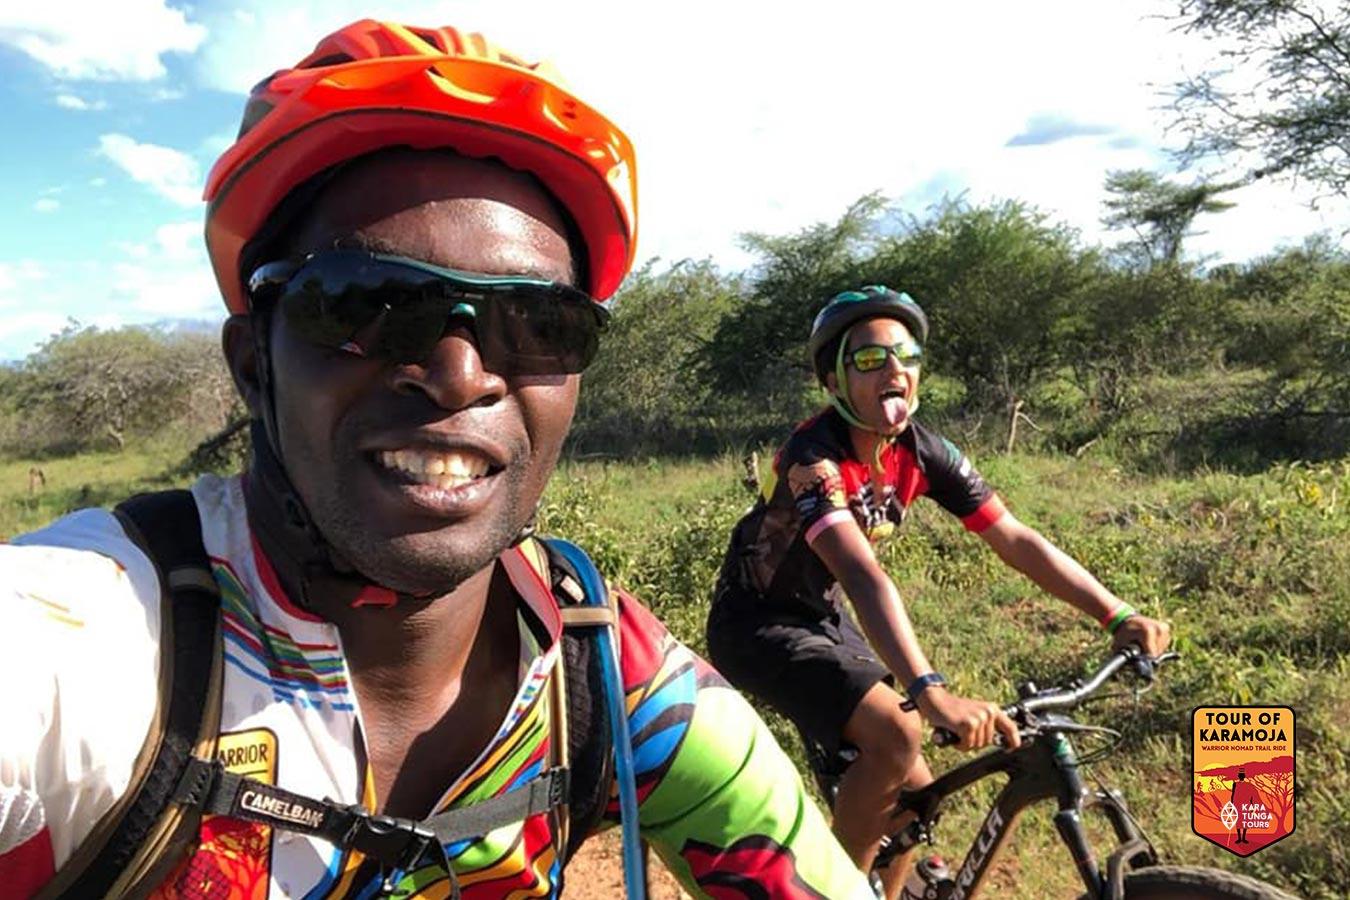 kara-tunga-tour-of-karamoja-2020-bike-event-uganda-amos-wakesa-2